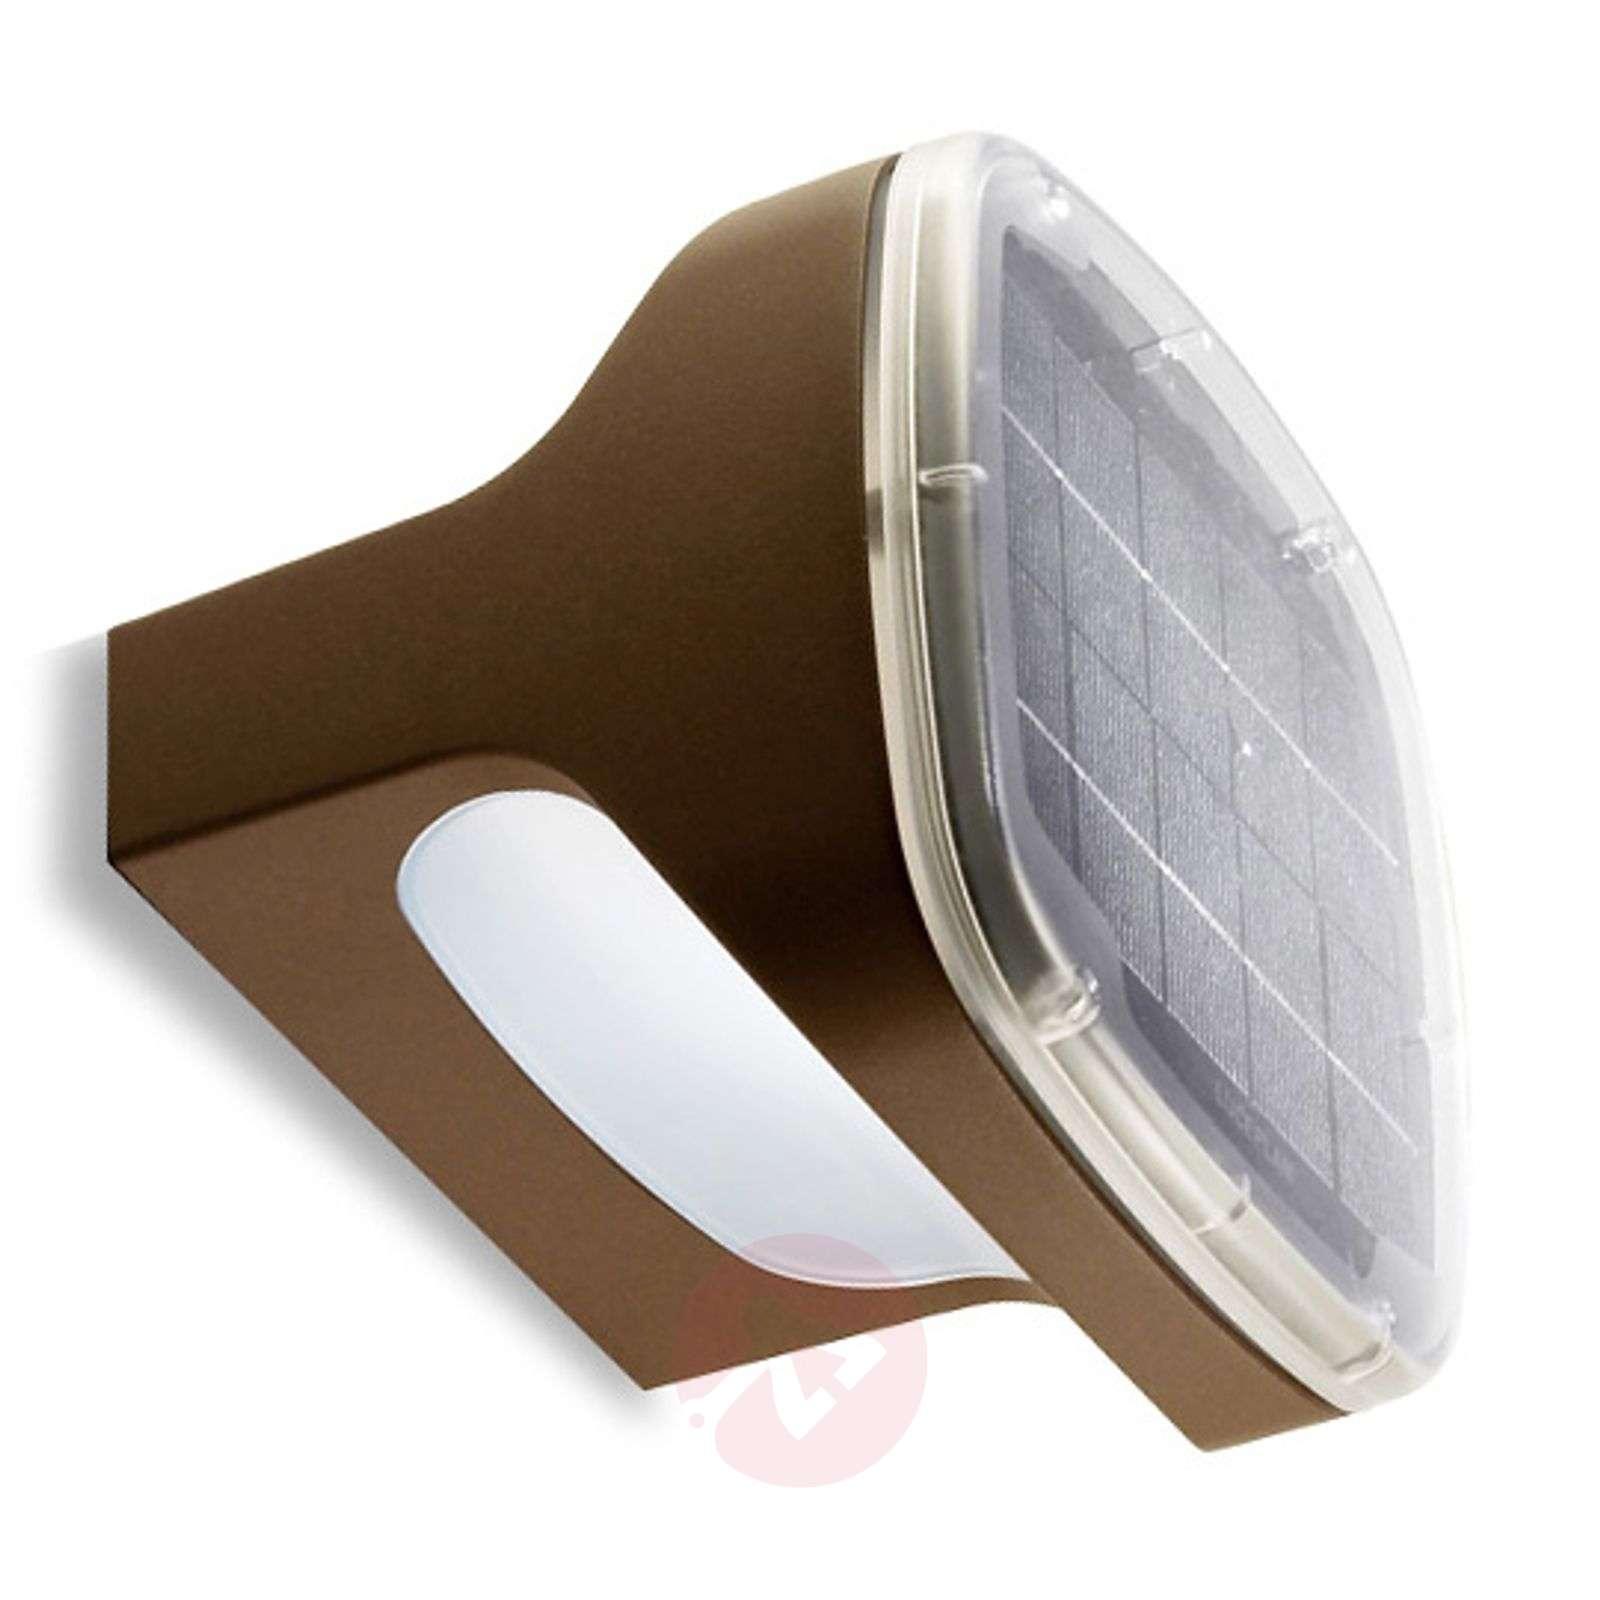 Huippumoderni Sky-LED-ulkoseinälamppu-6030129X-02